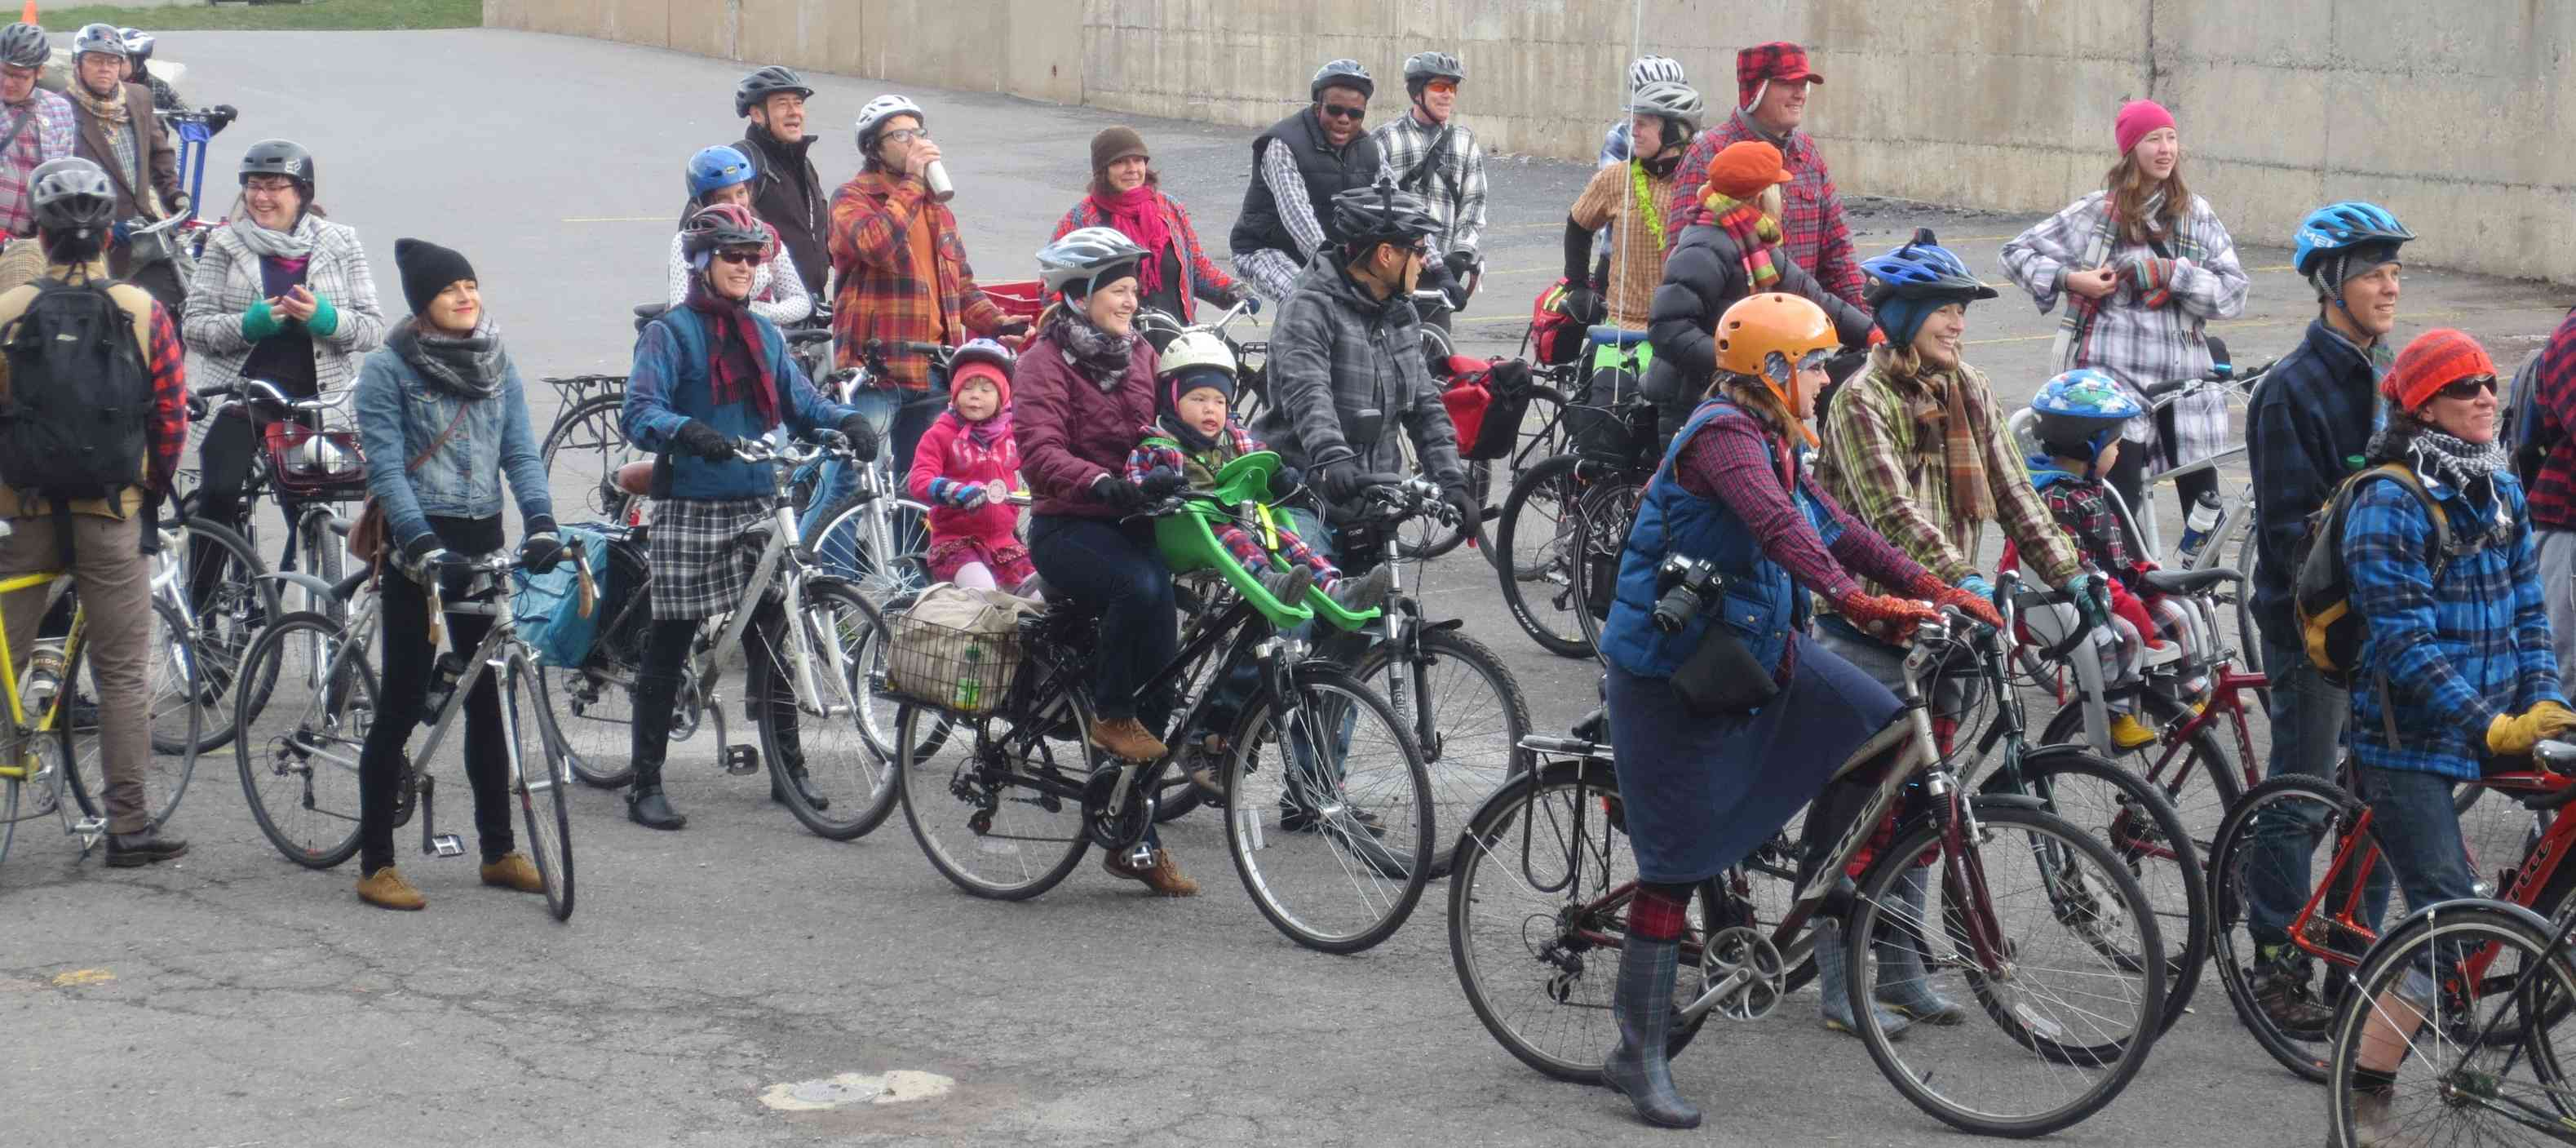 2013 10 27 Ottawa Plaid Parade – Hans Moor 19